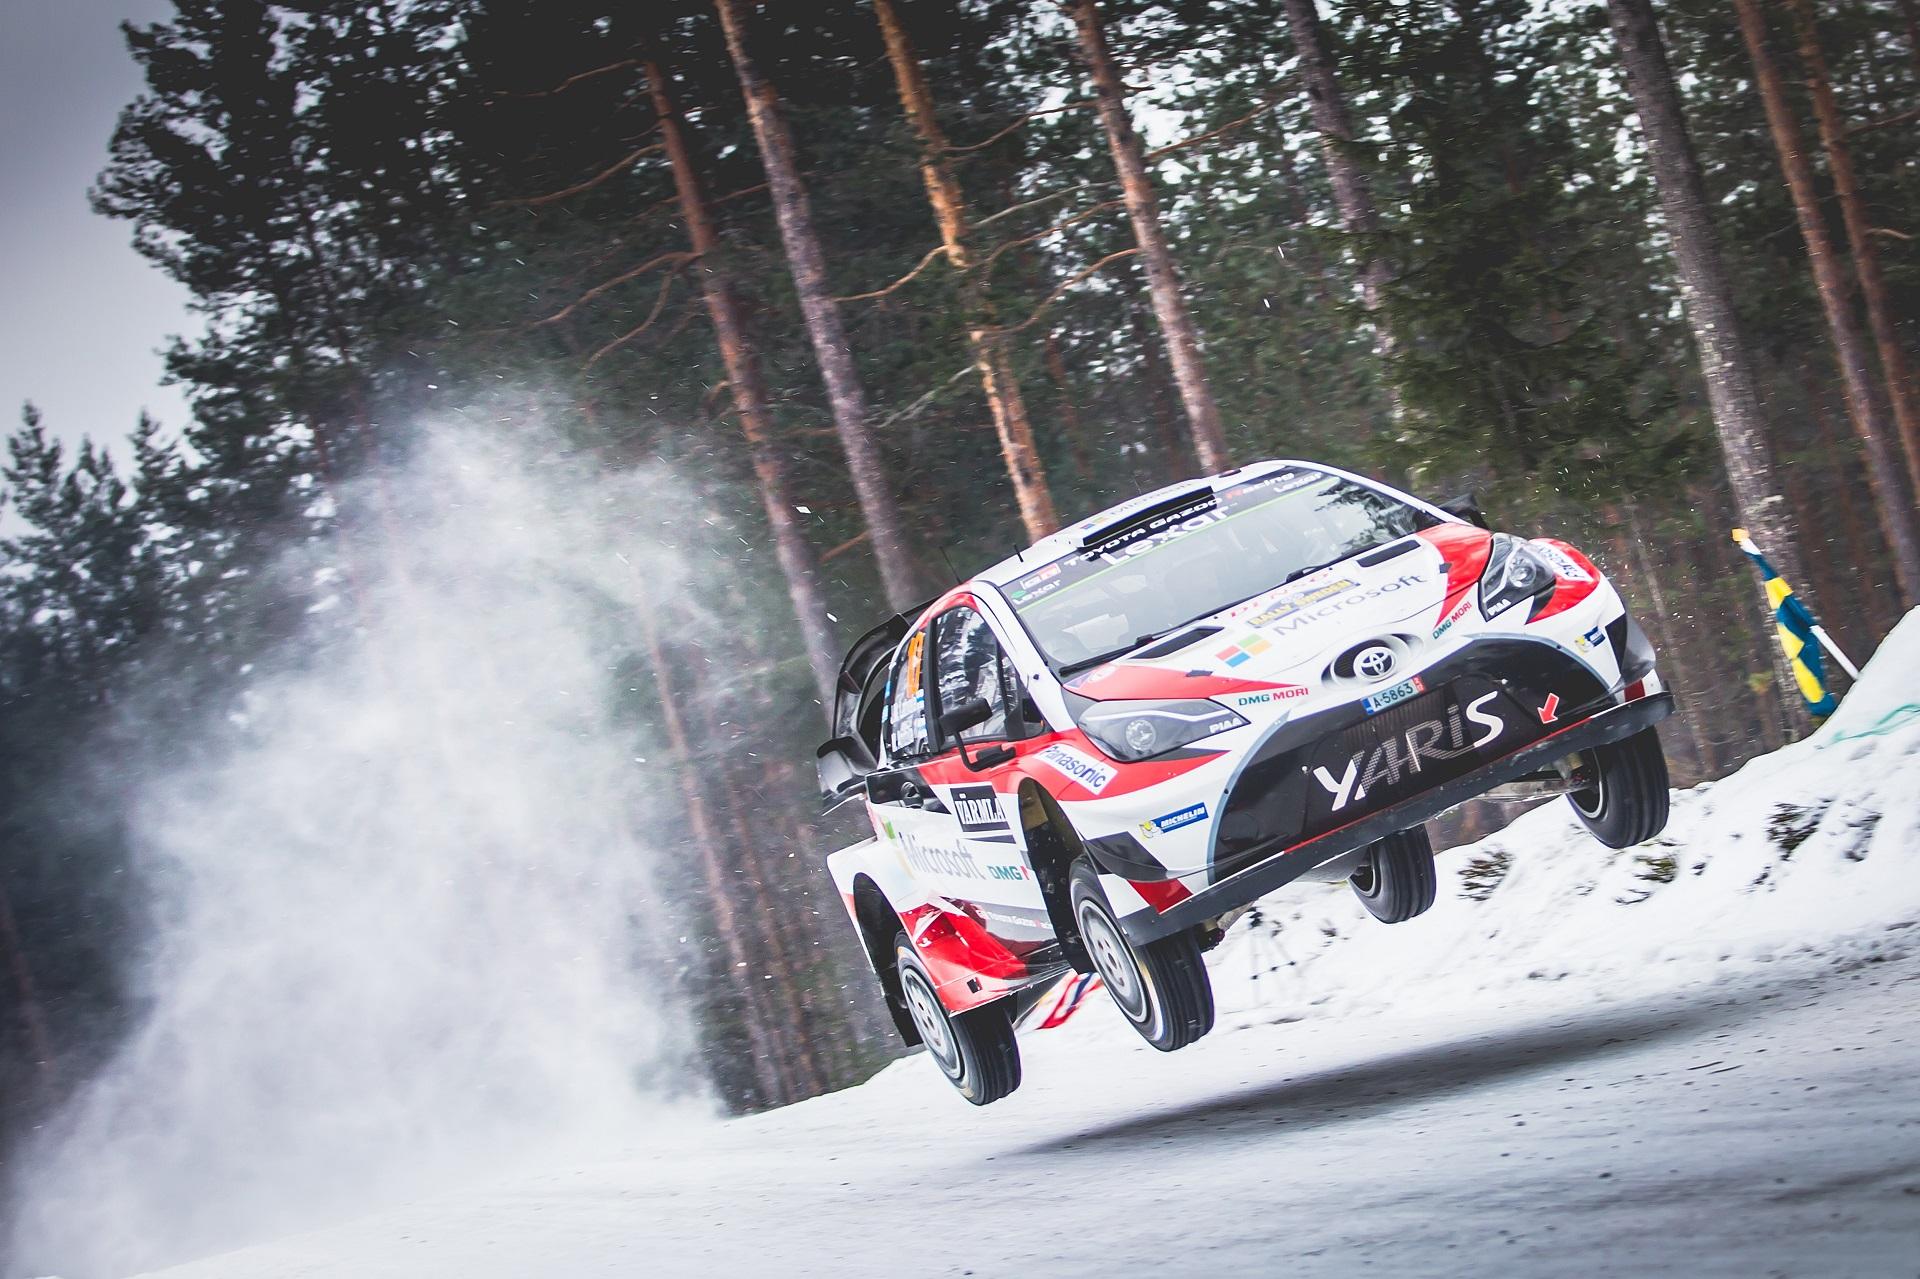 FIA WORLD RALLY CHAMPIONSHIP 2017 -WRC Sweden (SWE) -  WRC 09/02/2017 to 12/02/2017 - PHOTO : @World